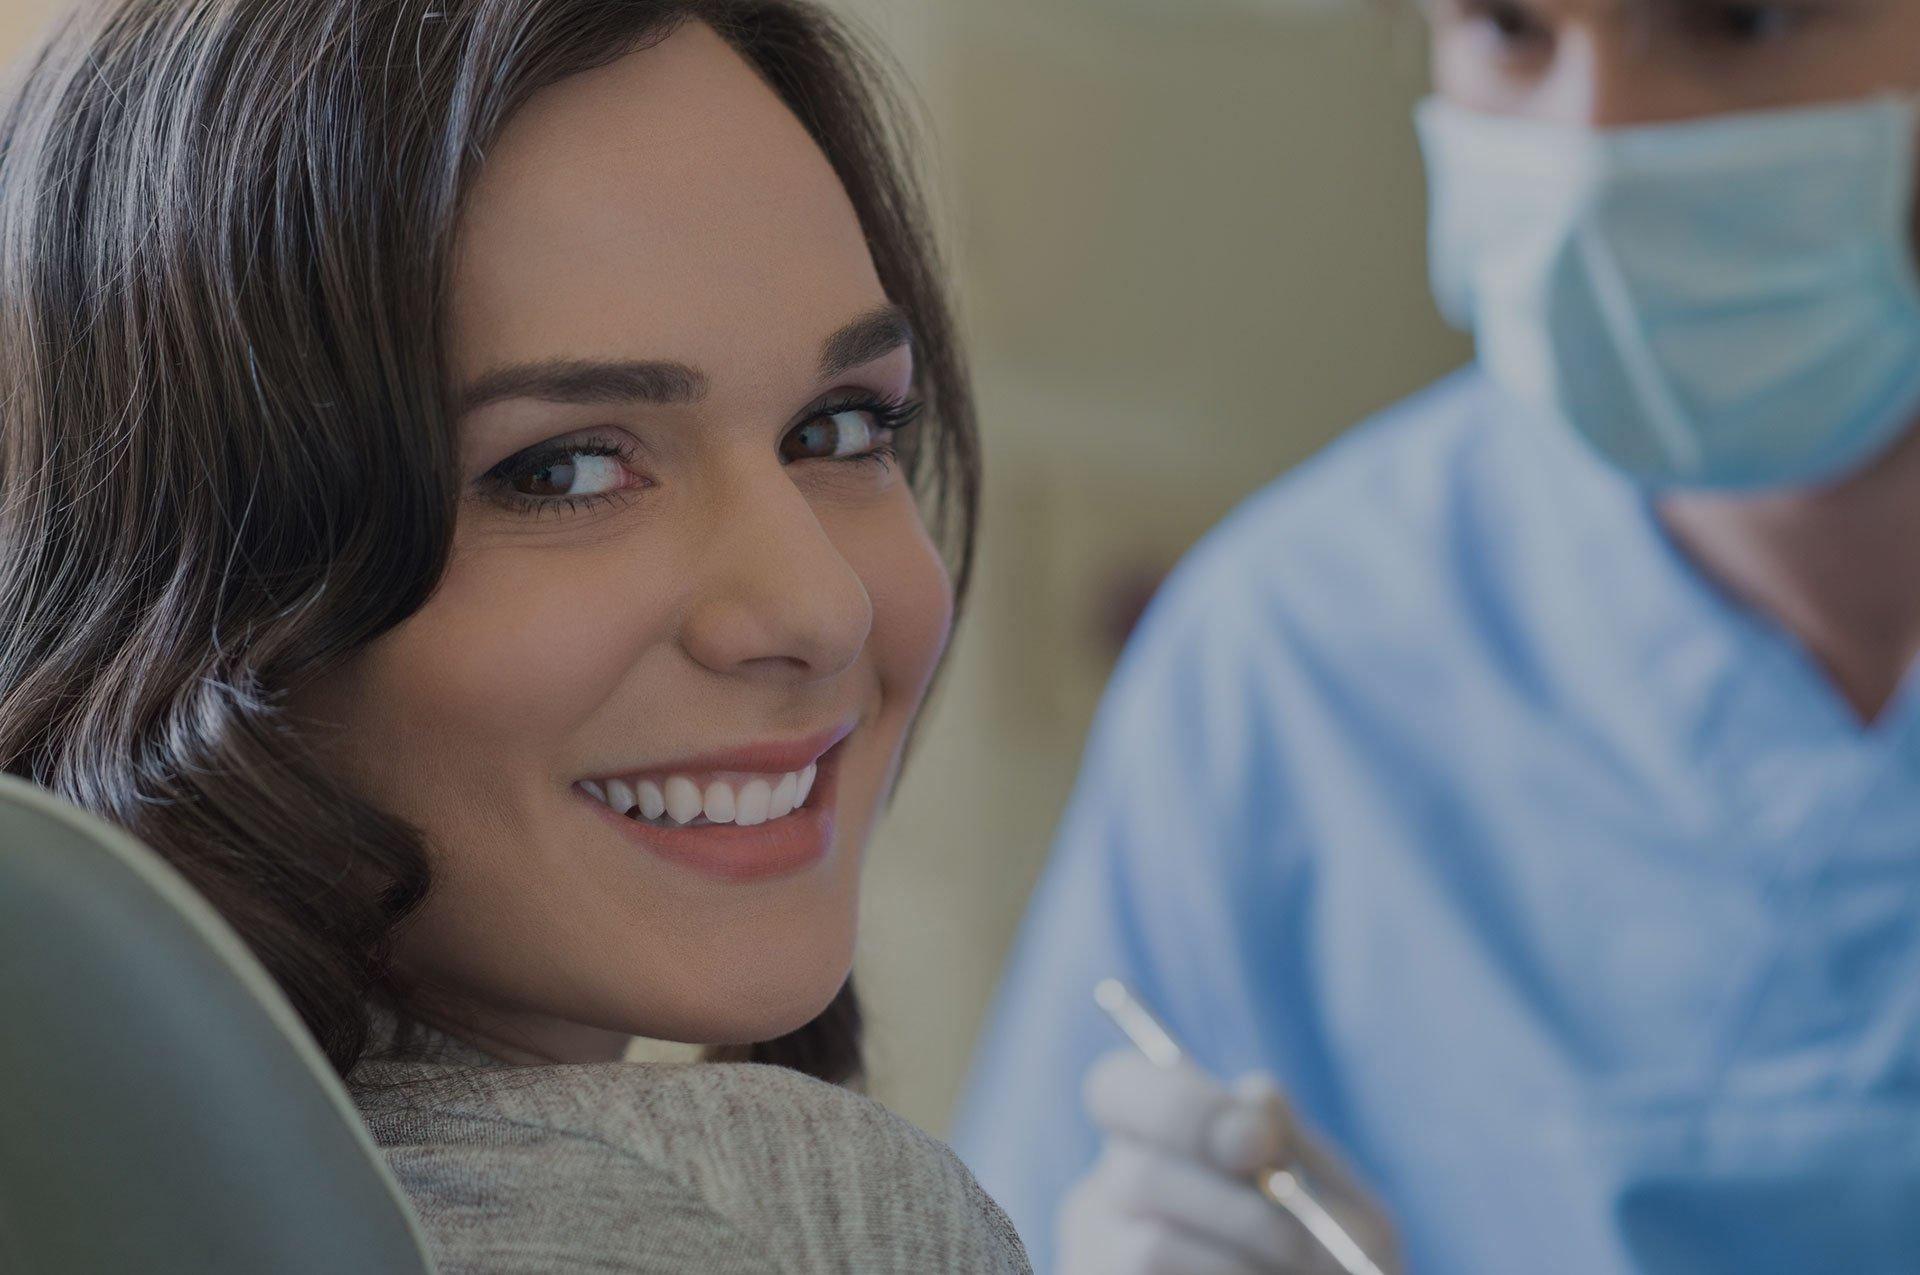 florida care main reviews bastien about fl comforter comfort us tallahassee dental dentist